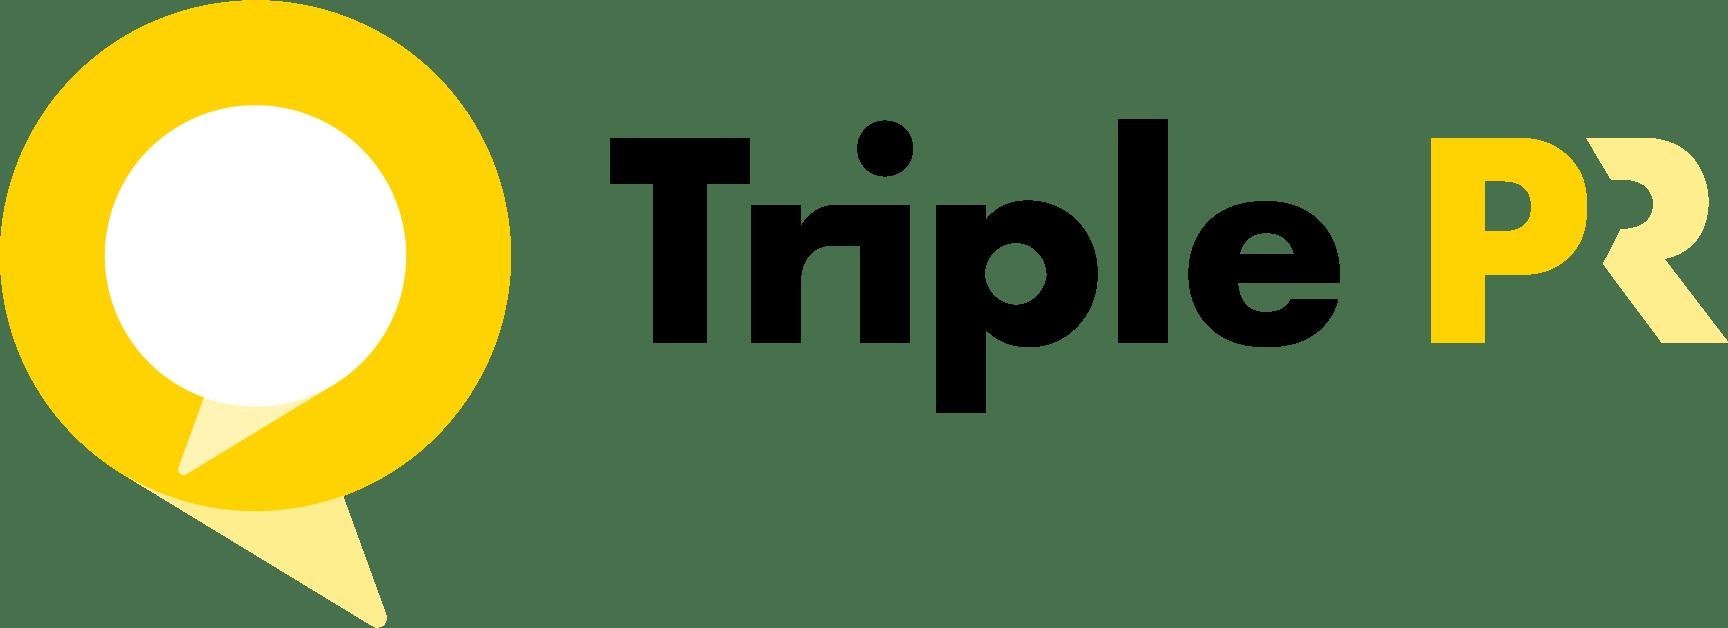 Biuro Prasowe agencji Triple PR logo